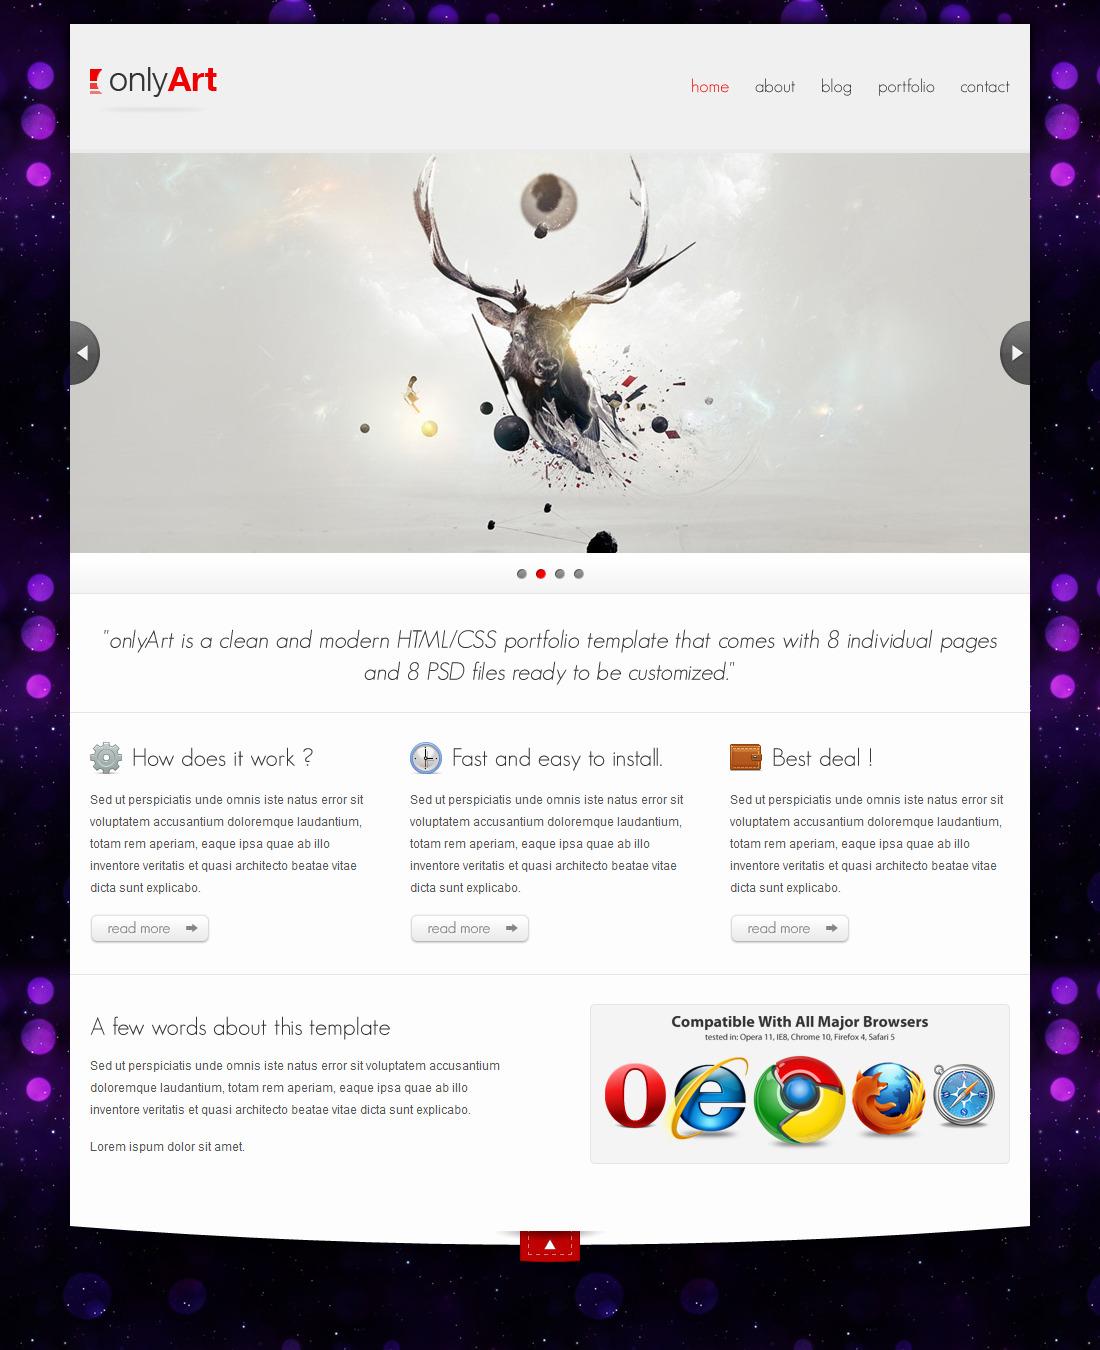 onlyArt | HTML/CSS Portfolio Template